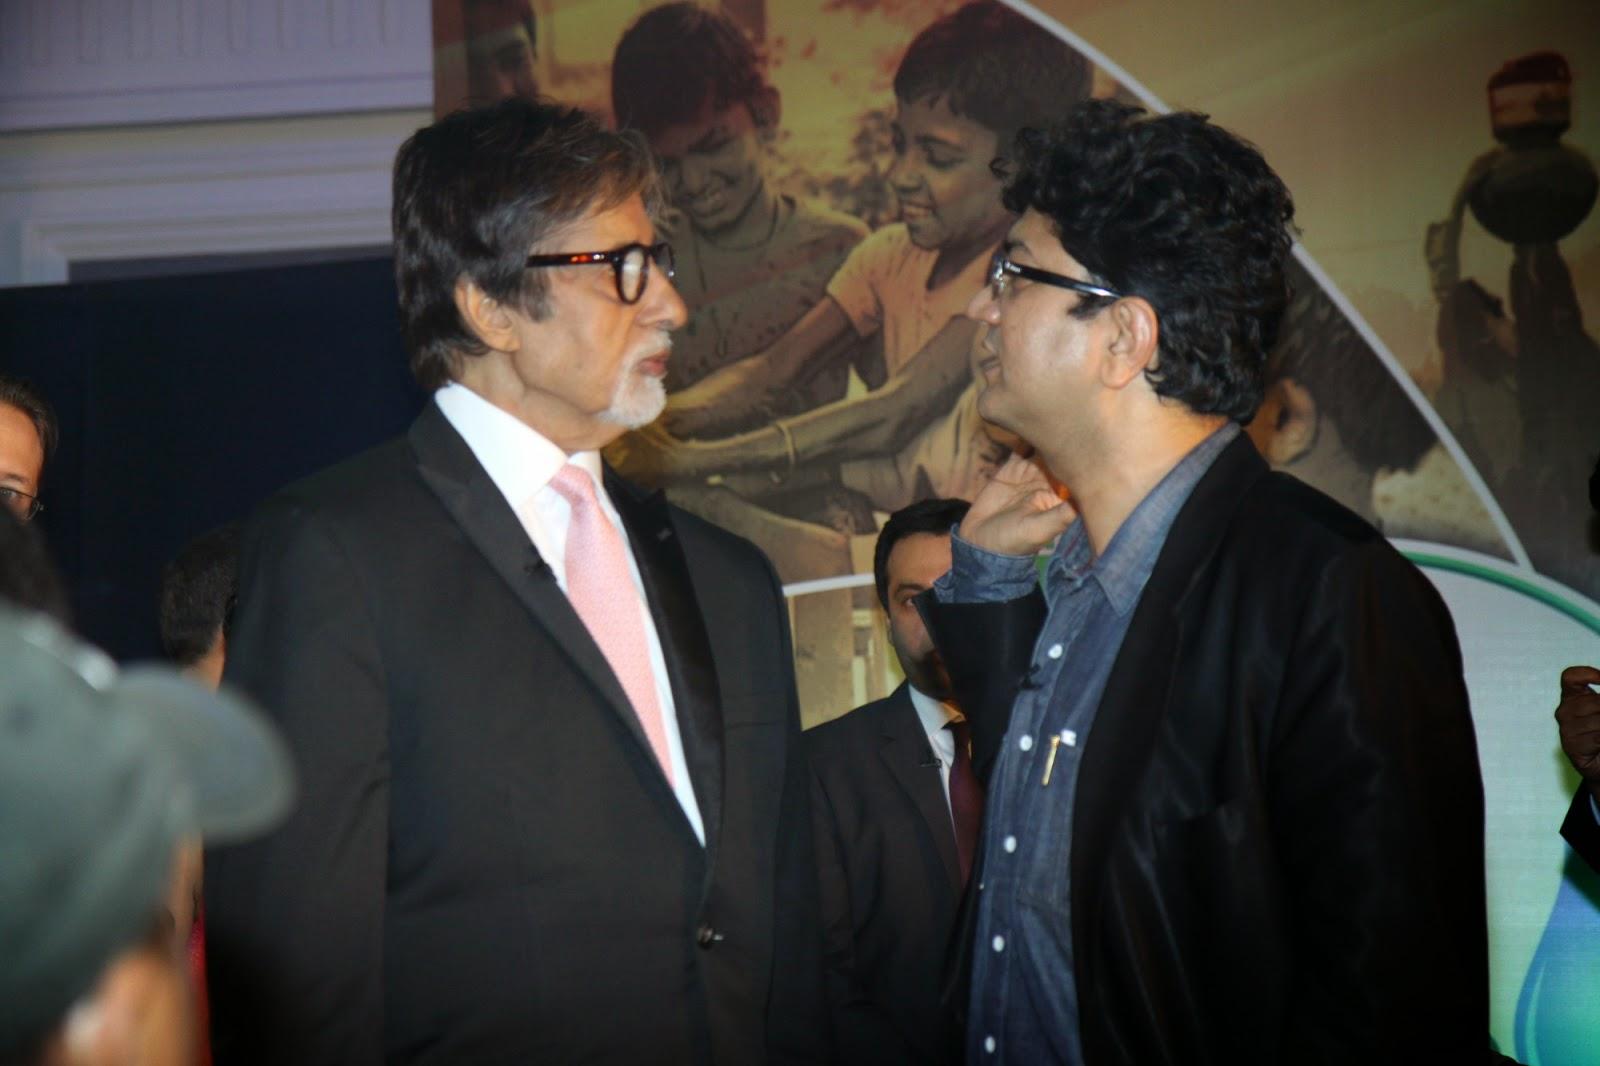 Amitabh Bachchan At Launch Of Dettol Banega Swachh India Initiative